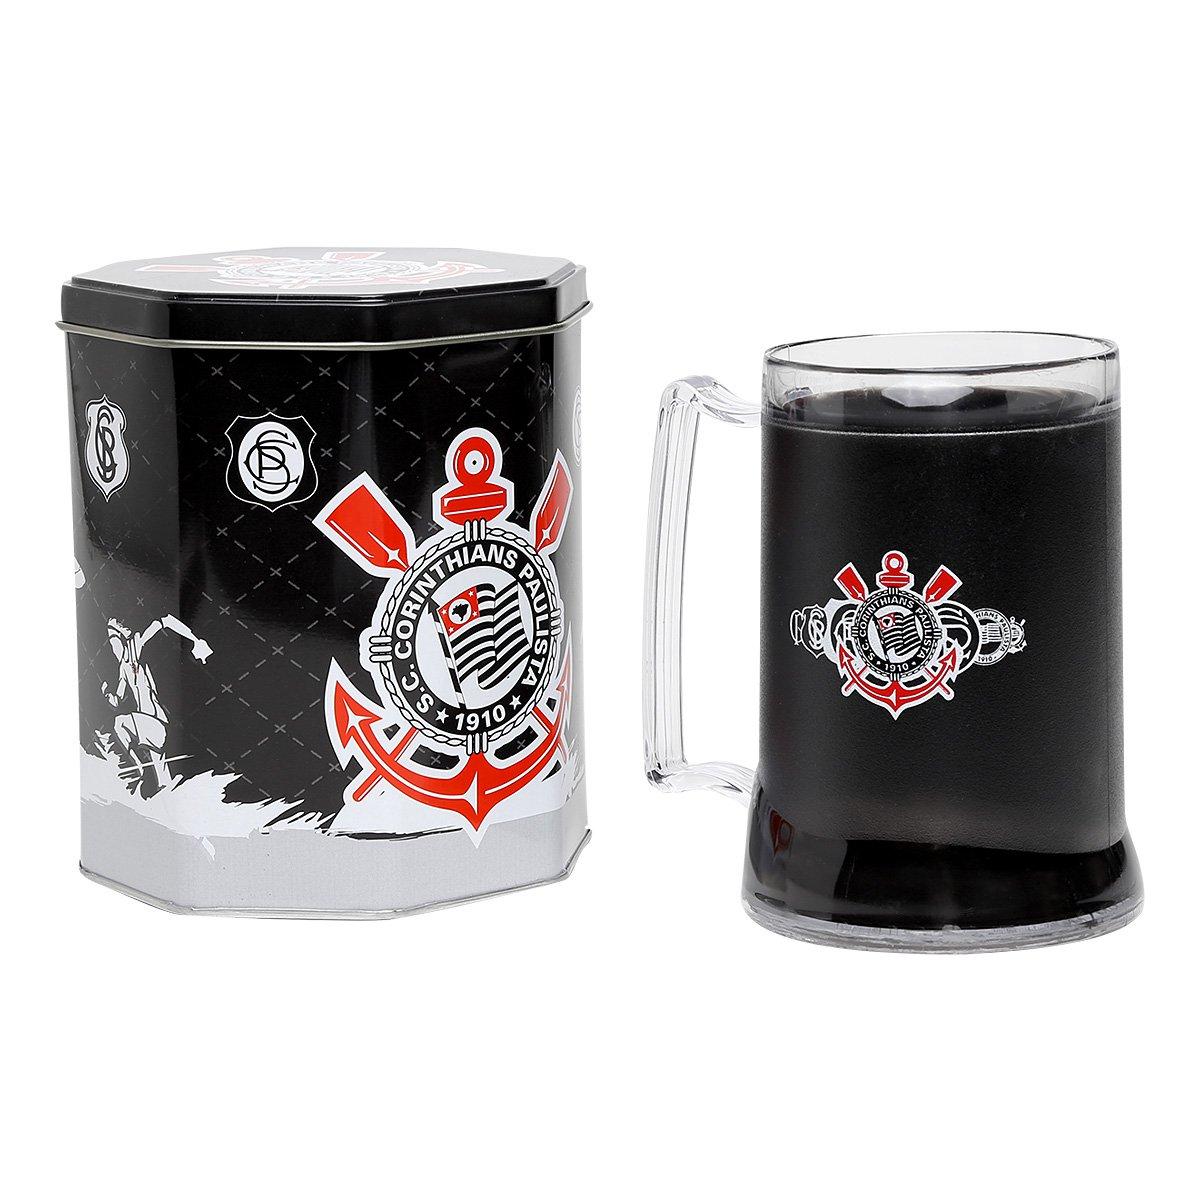 Caneca Corinthians Gel Lata Octogonal 400 ml - Compre Agora  8d5d5fe9f2ff8